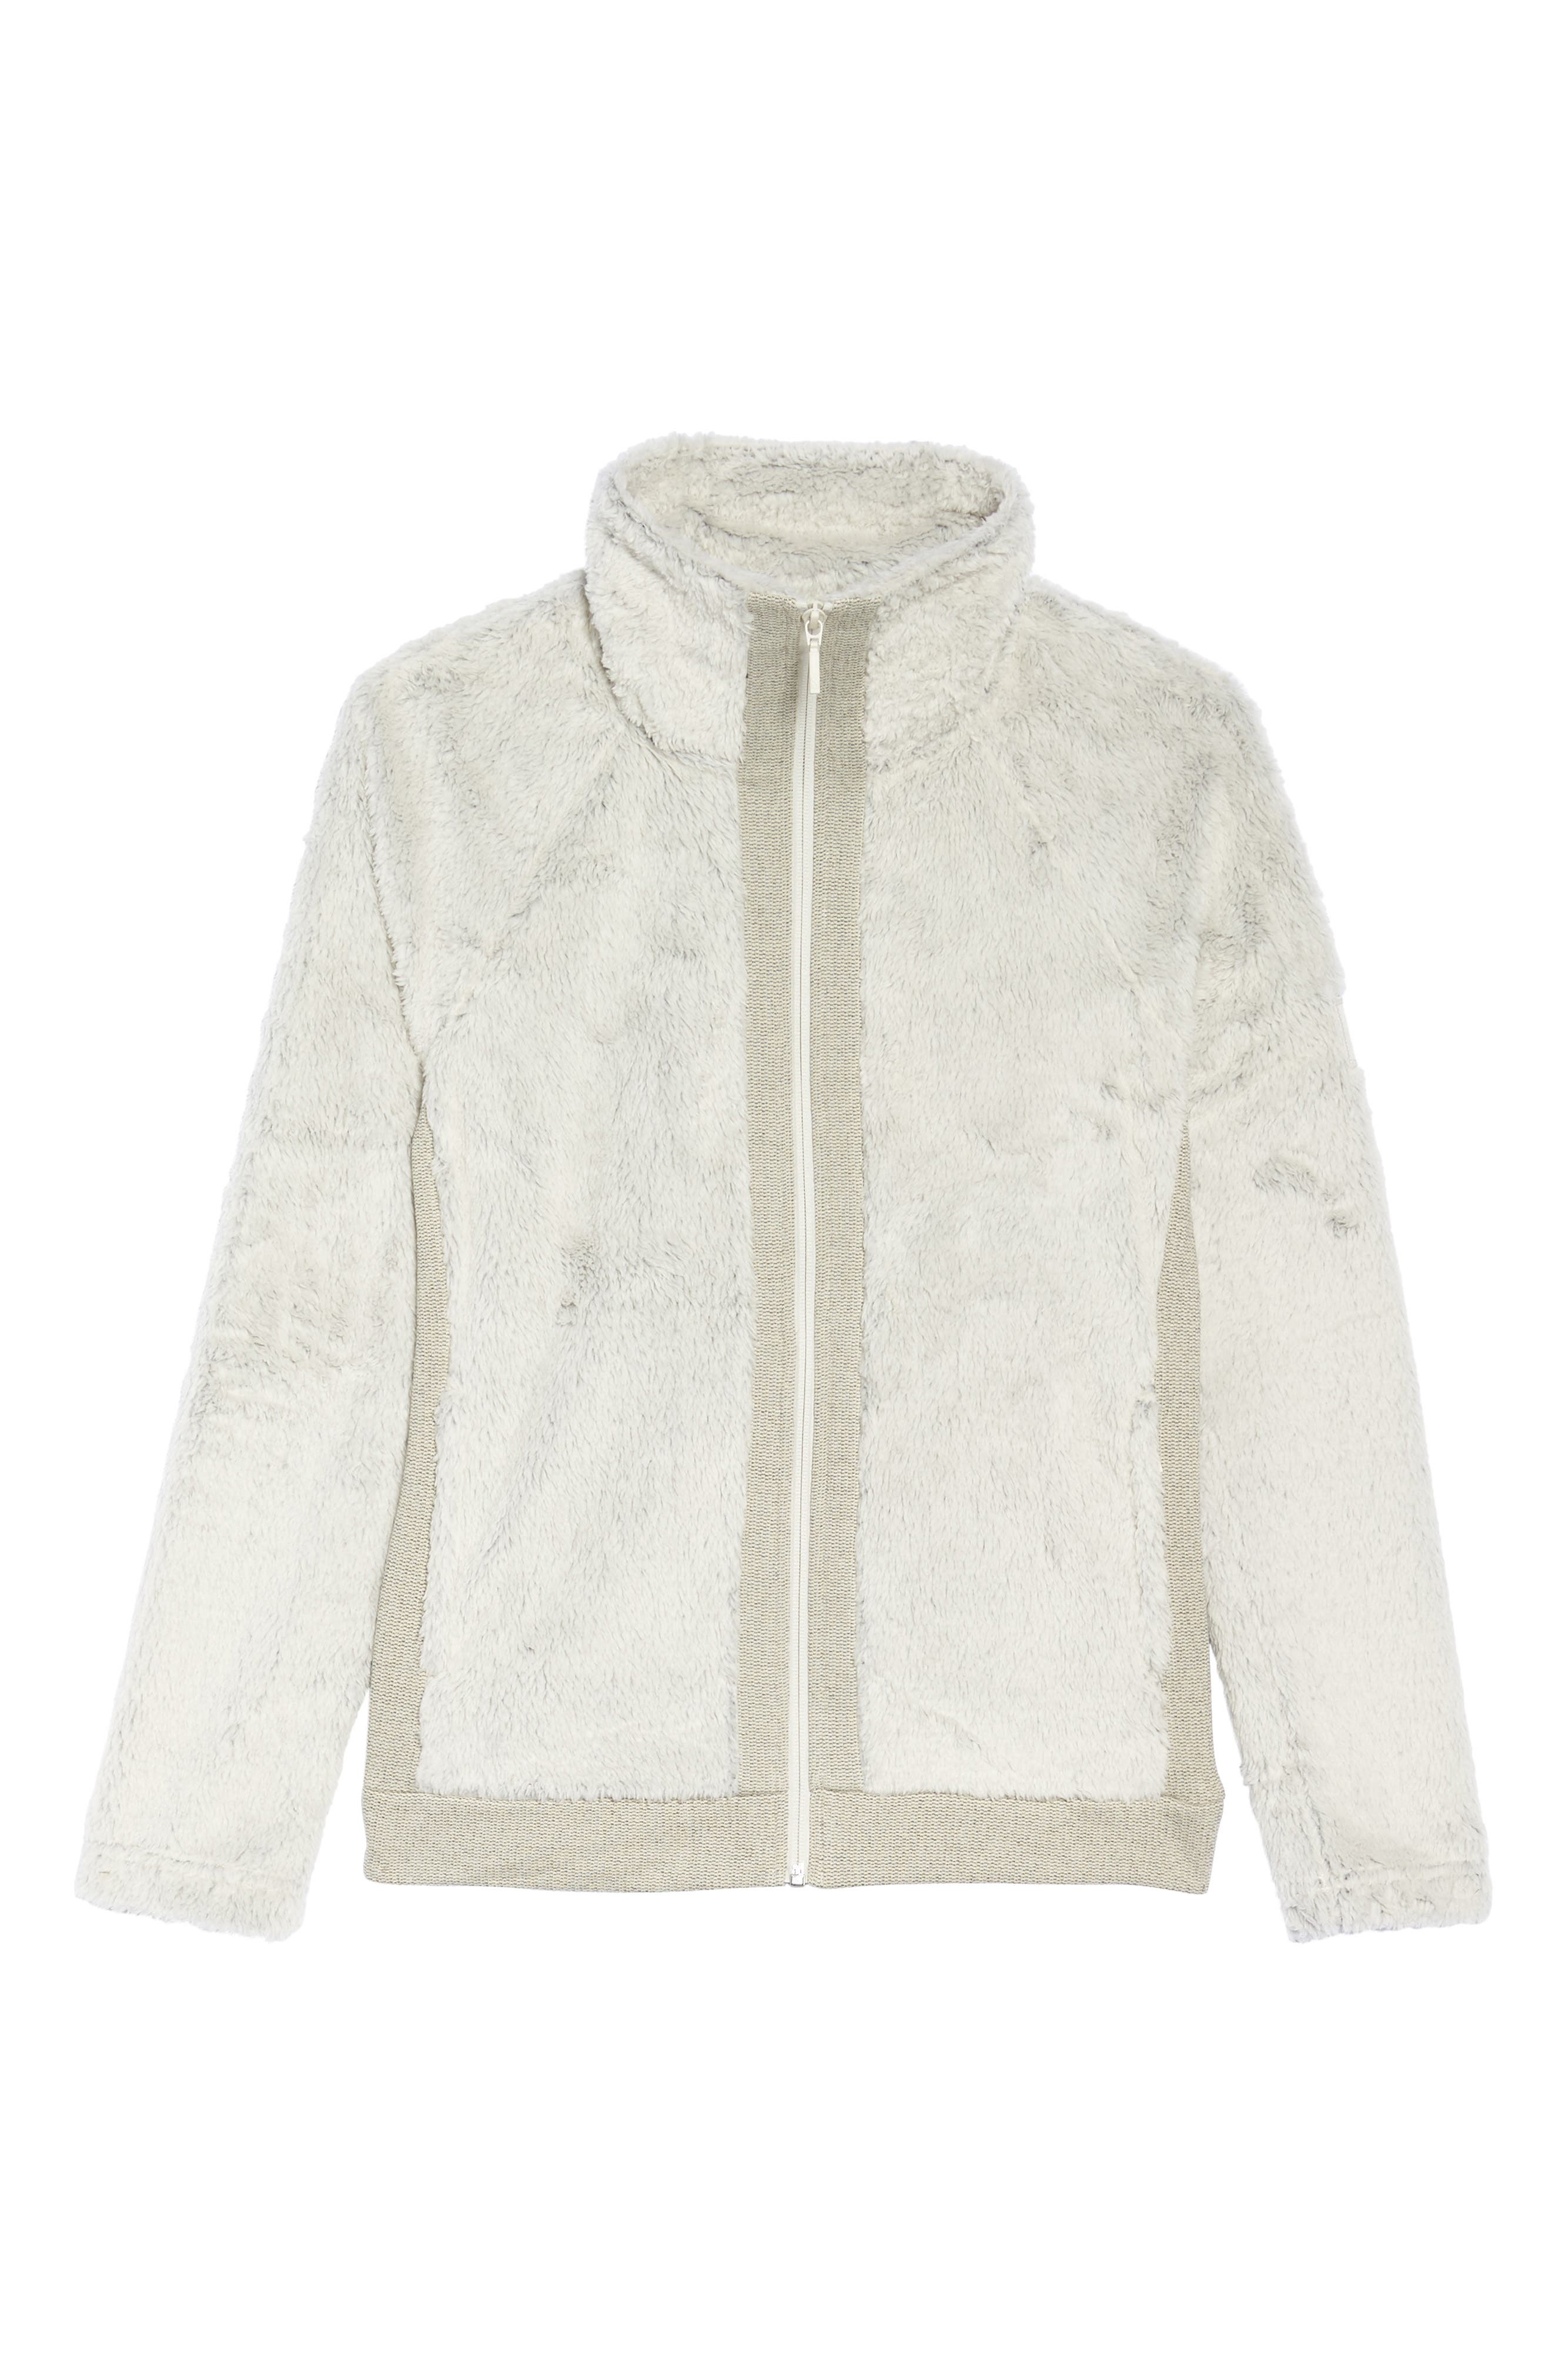 Furry Fleece Jacket,                             Alternate thumbnail 36, color,